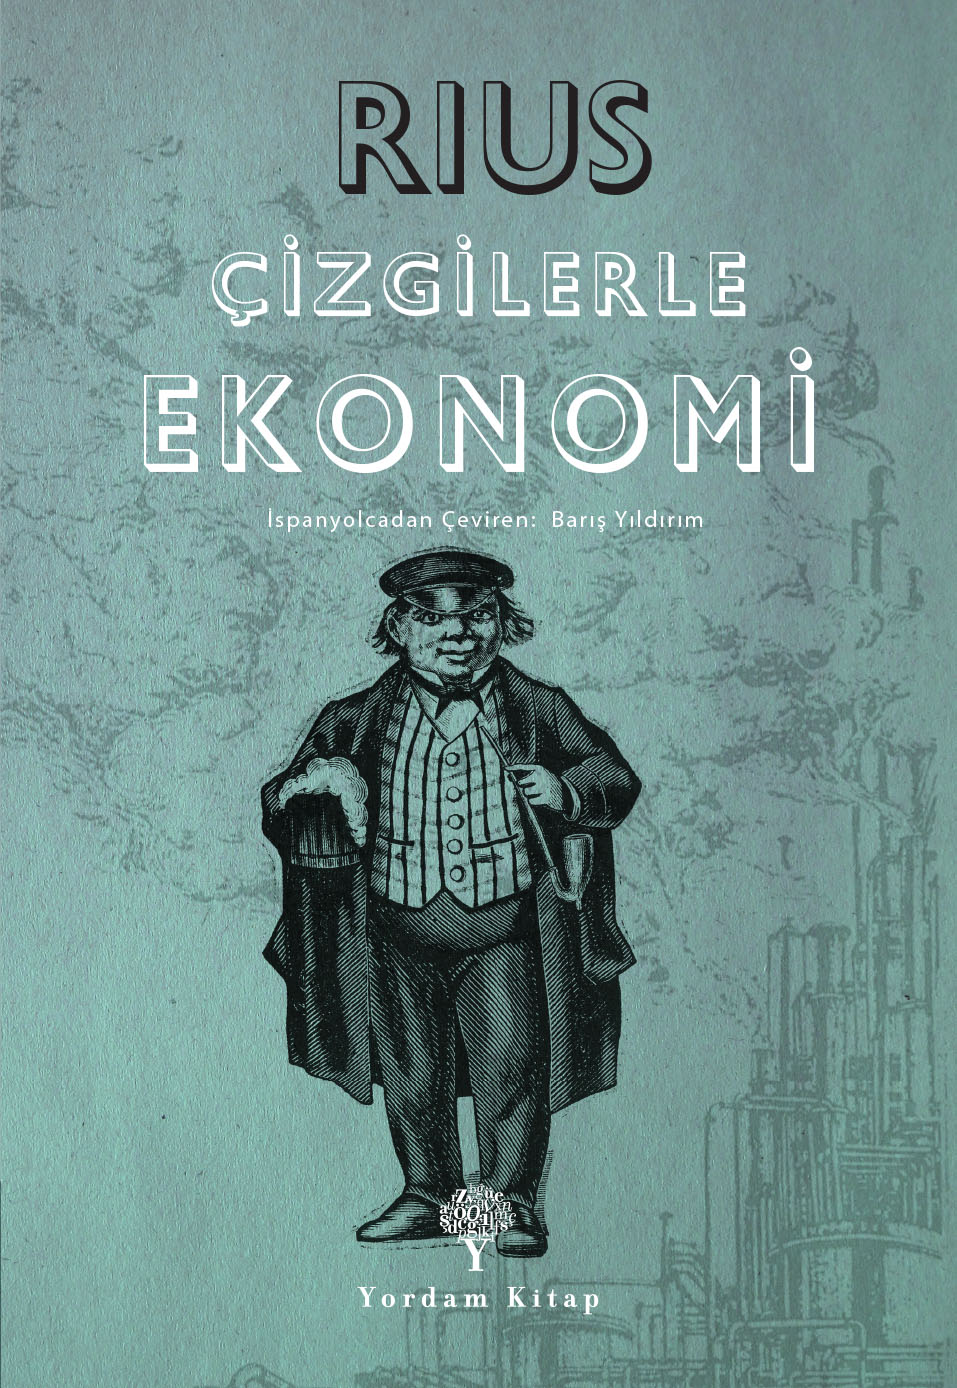 Rius_Cizgilerle_Ekonomi_Kapak.indd